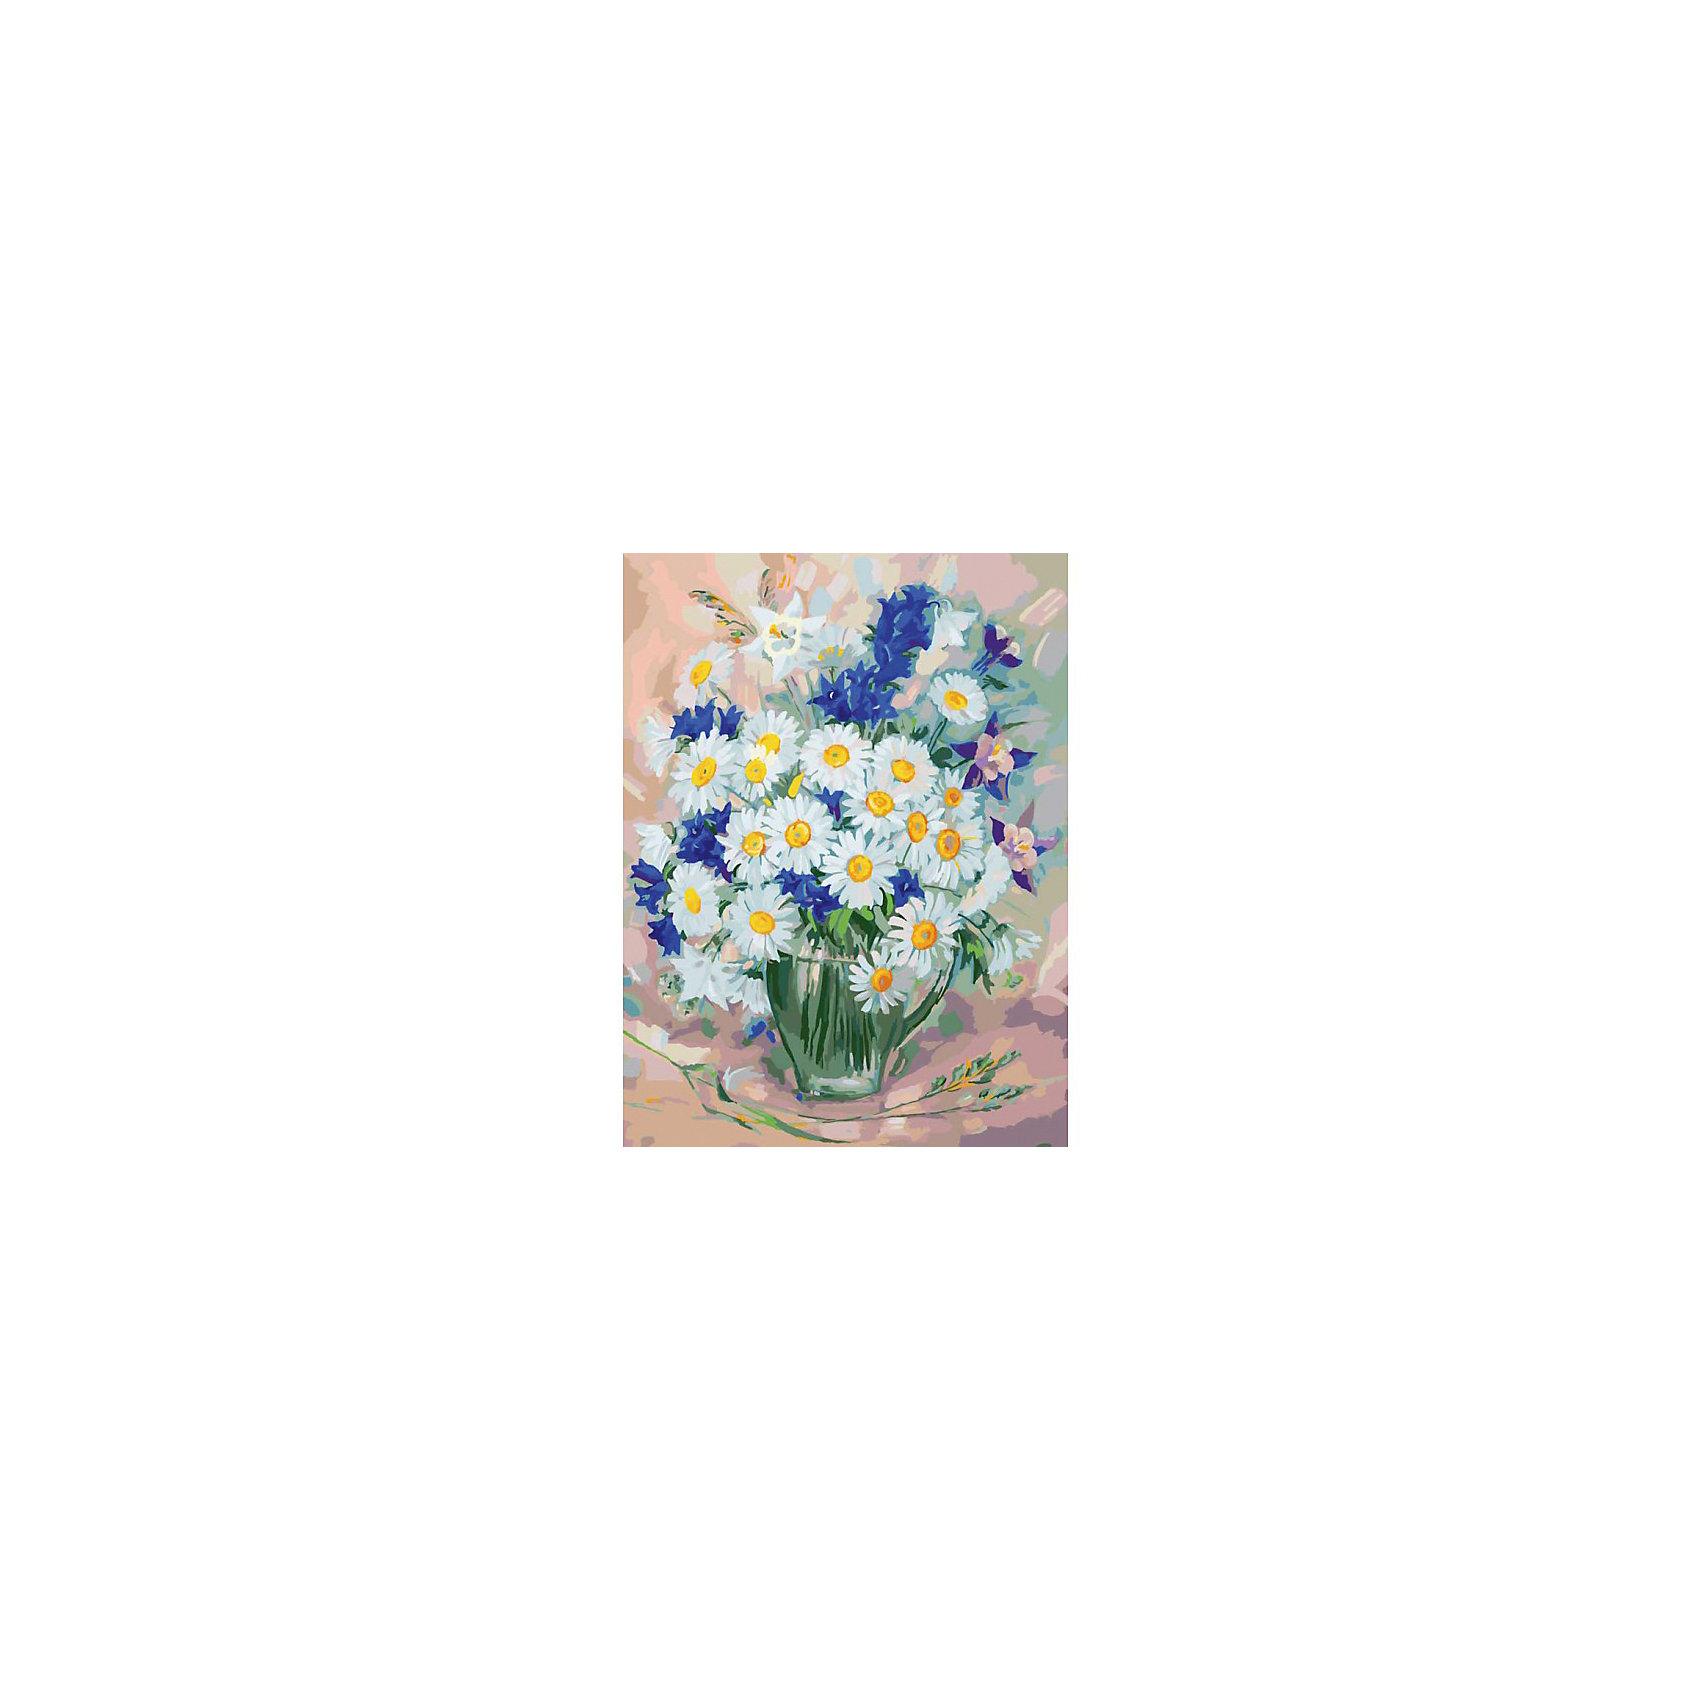 Белоснежка Живопись на картоне 30*40 см Ромашки белоснежка живопись на картоне 30 40 см гранд канал венеция